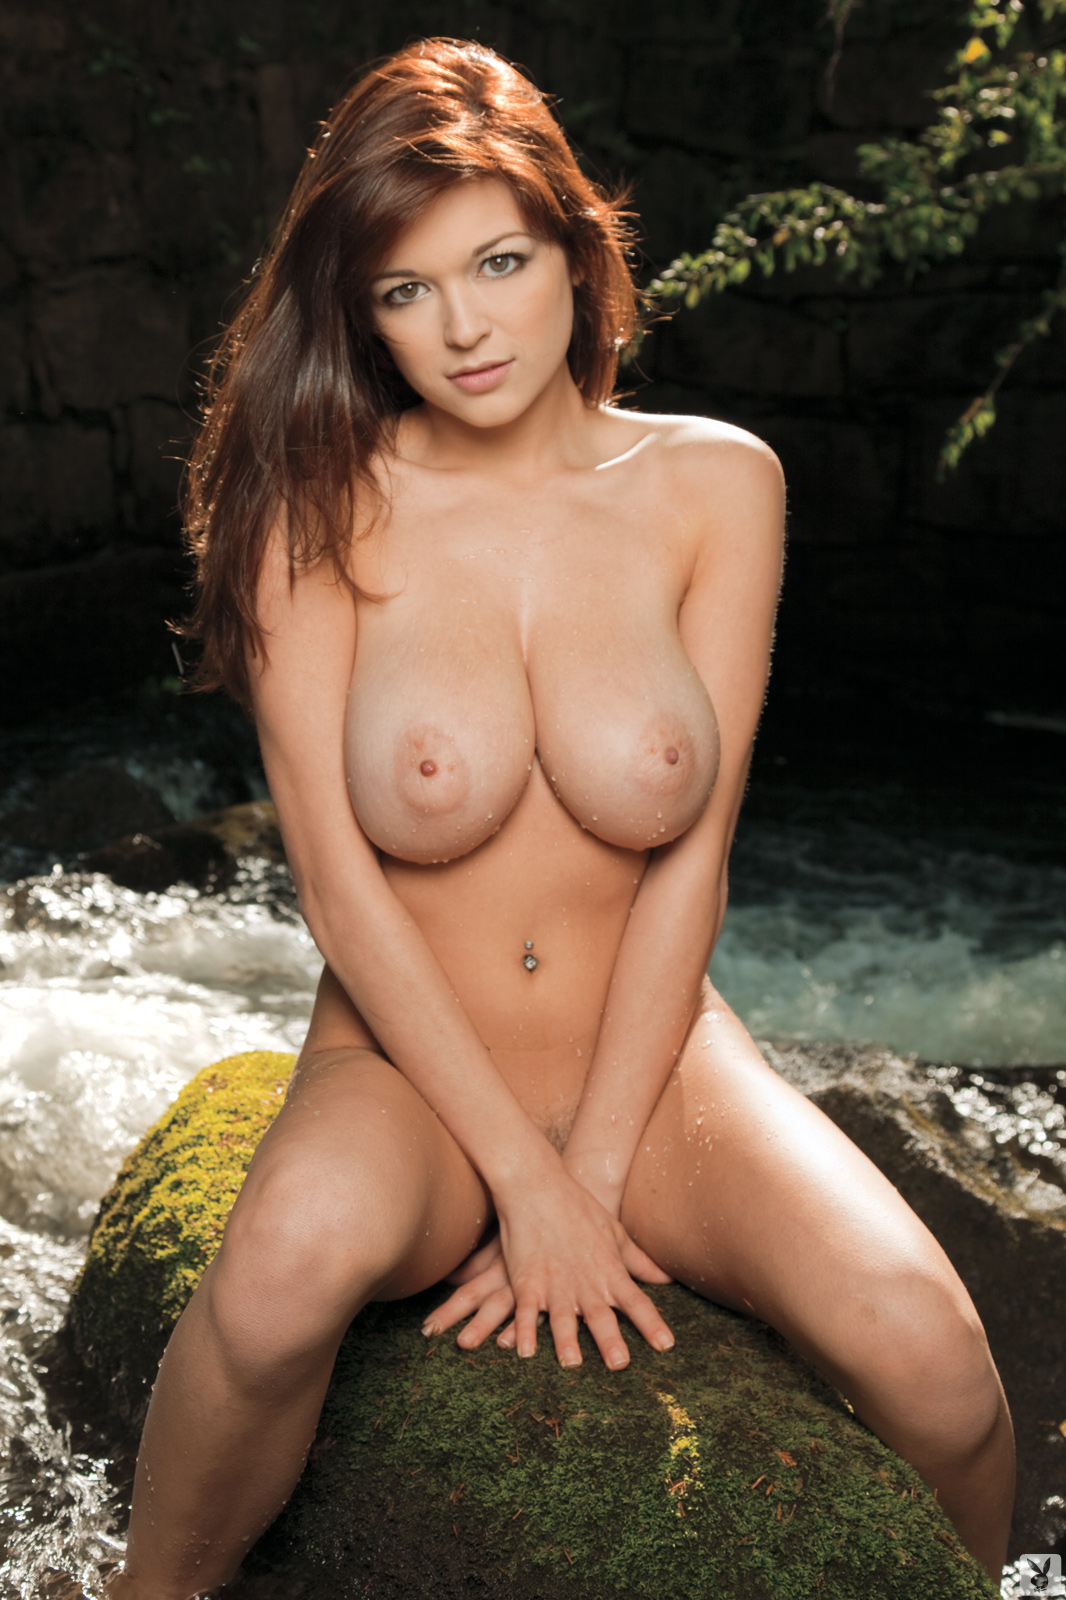 Xxx nude firemen pictures